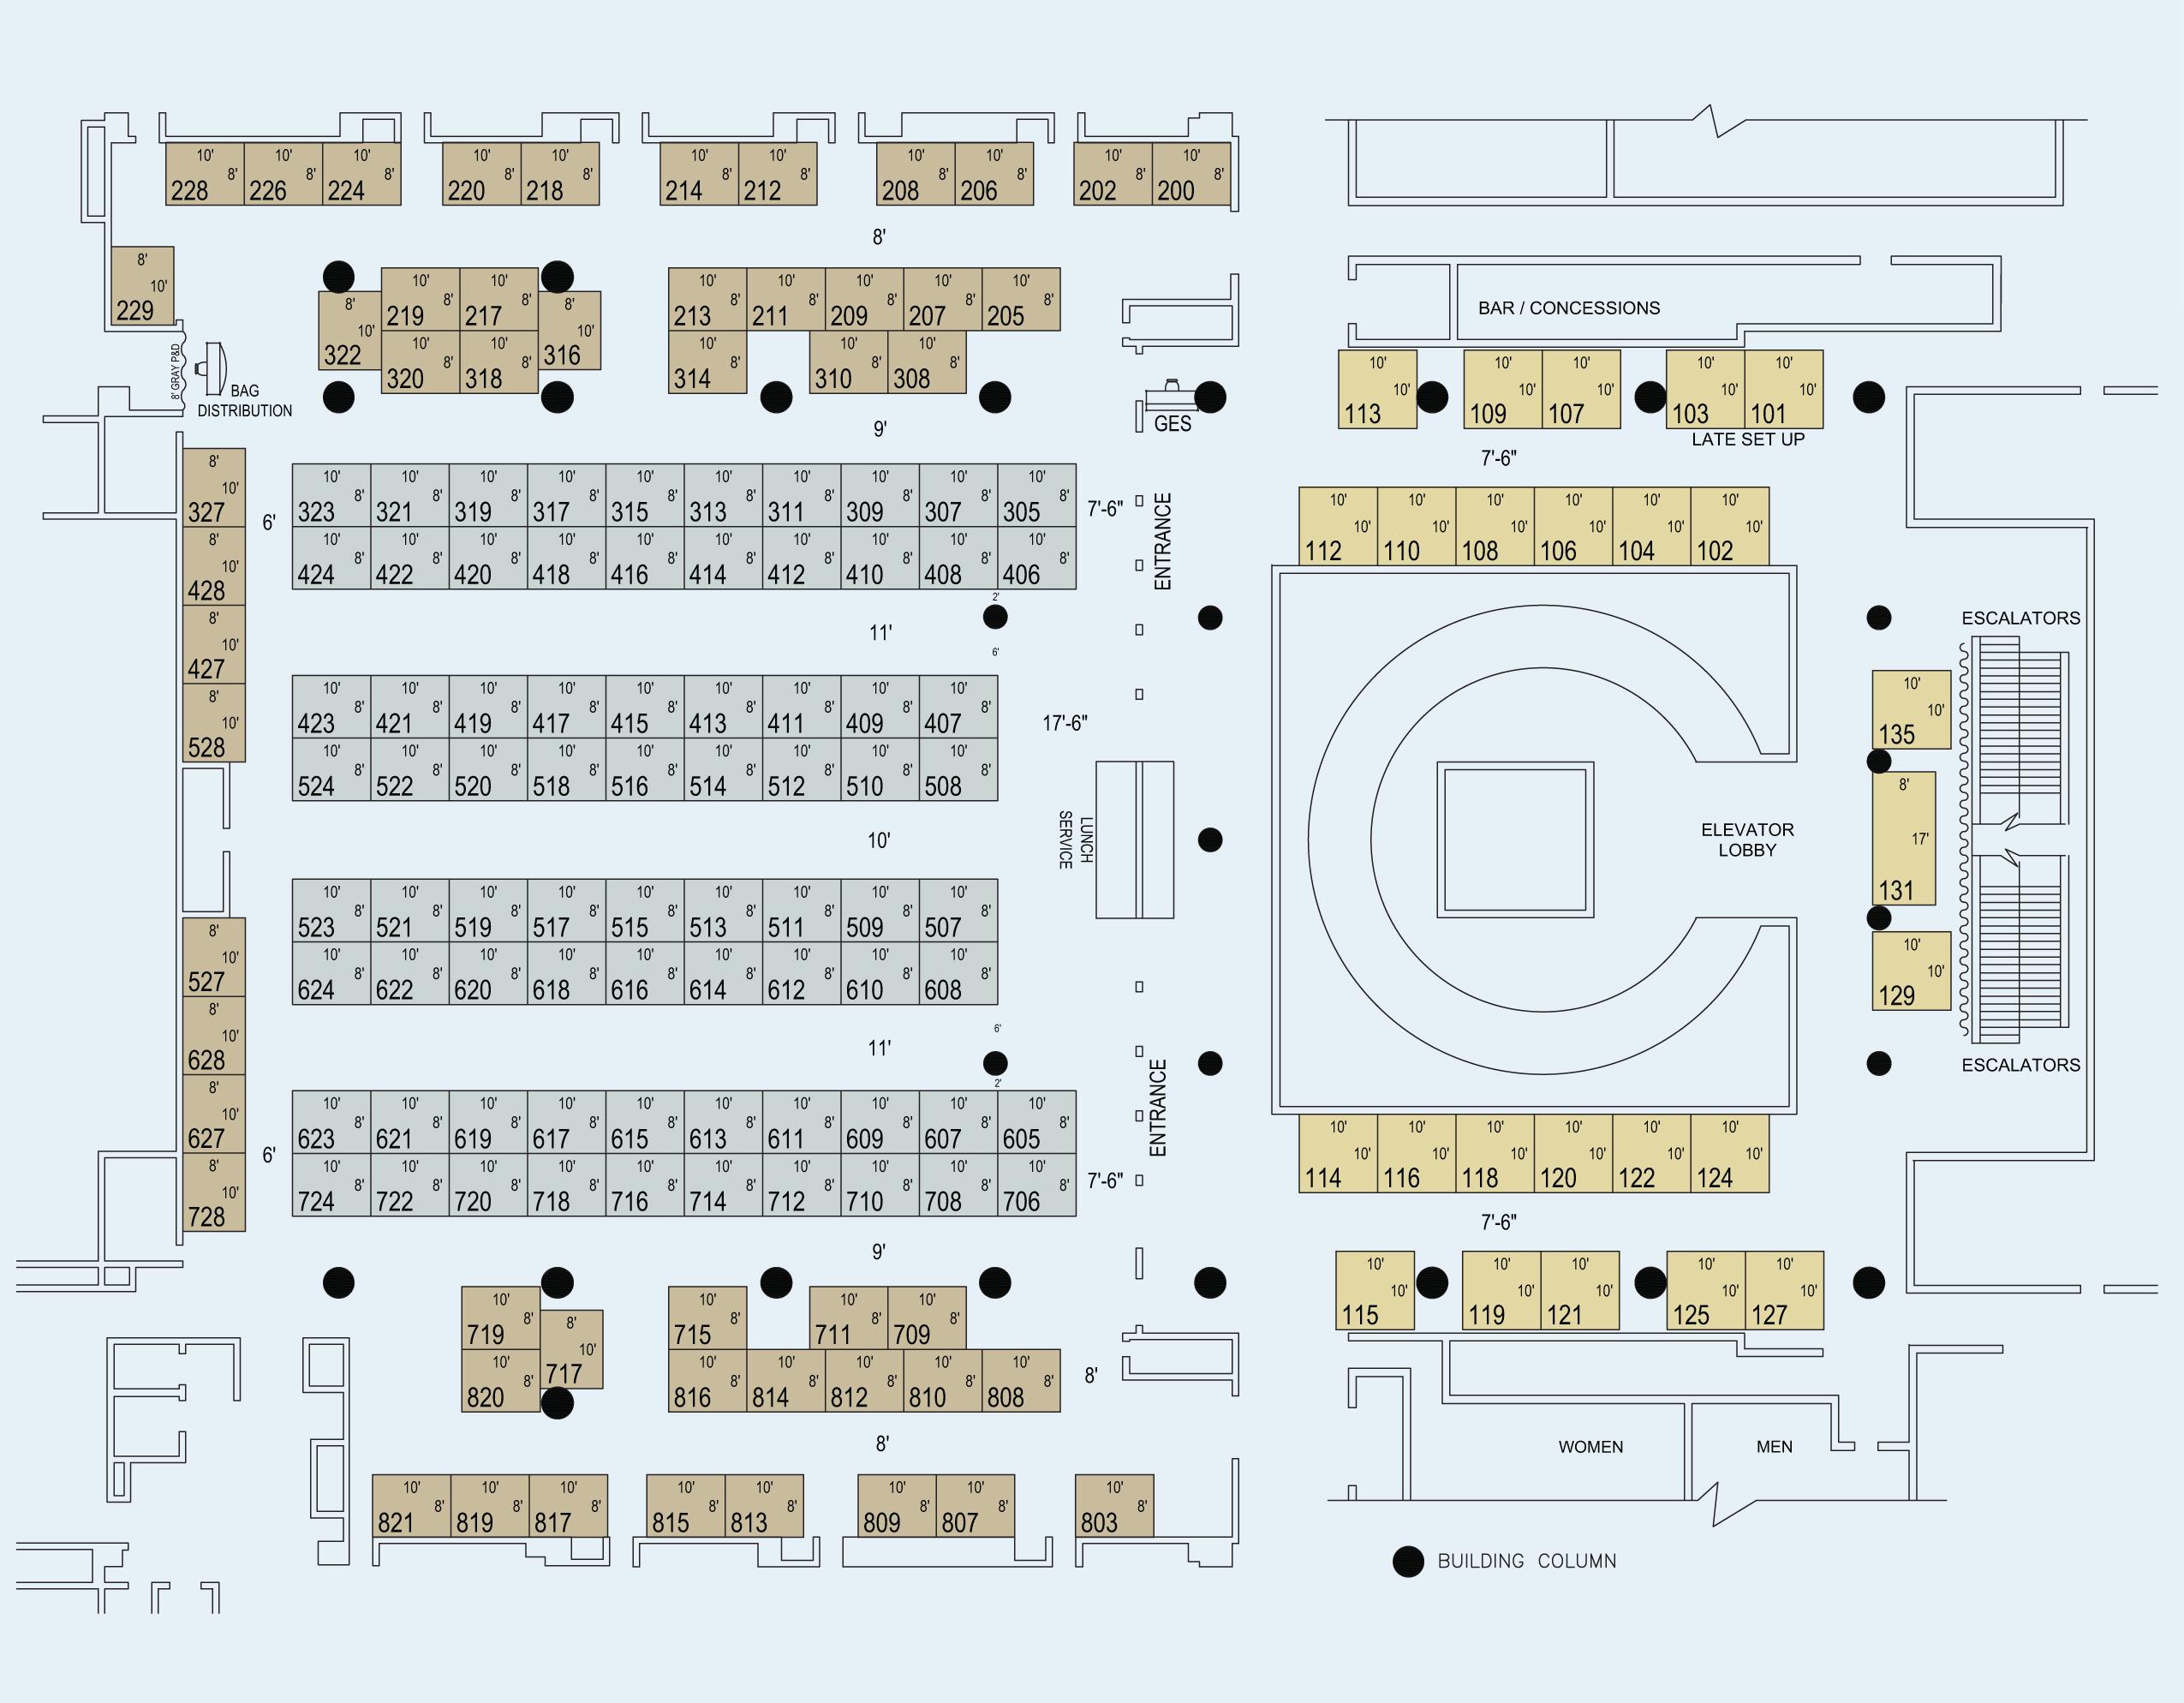 PGA71 Exhibitor Floor Plan